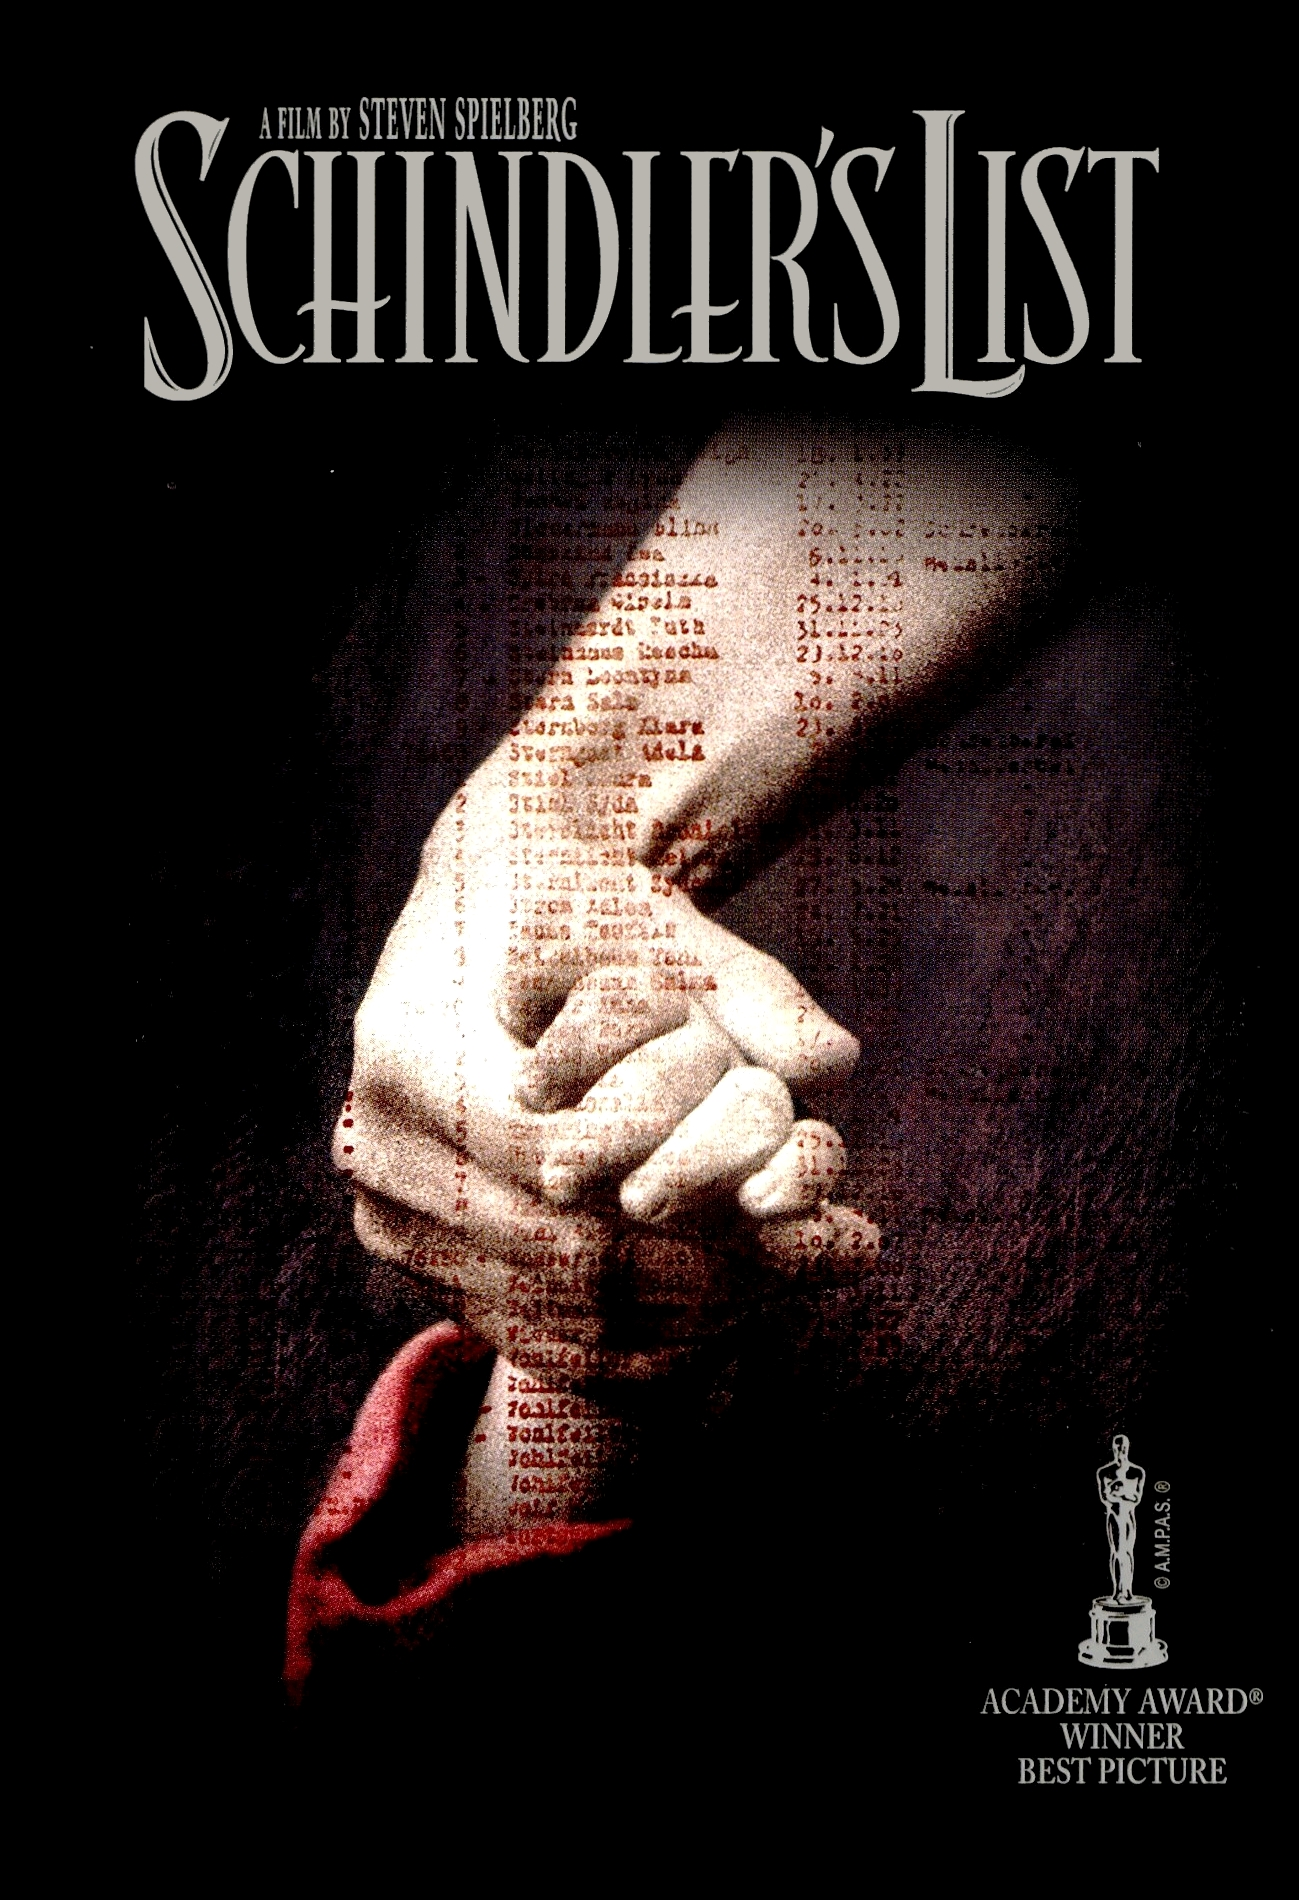 Film Schindlers Liste